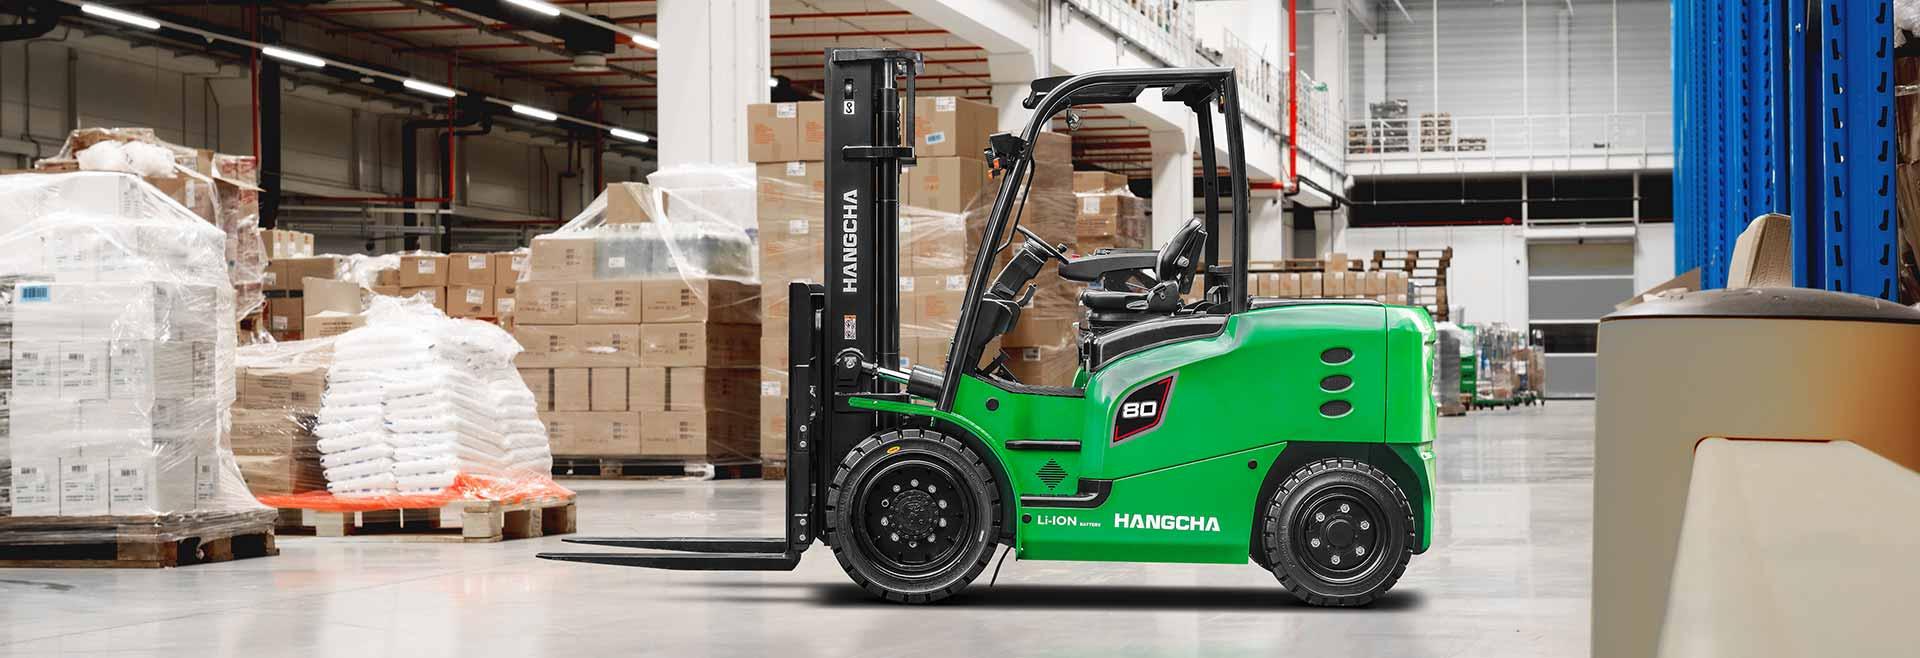 J Series 5.0 - 8.5t Hangcha Trucks